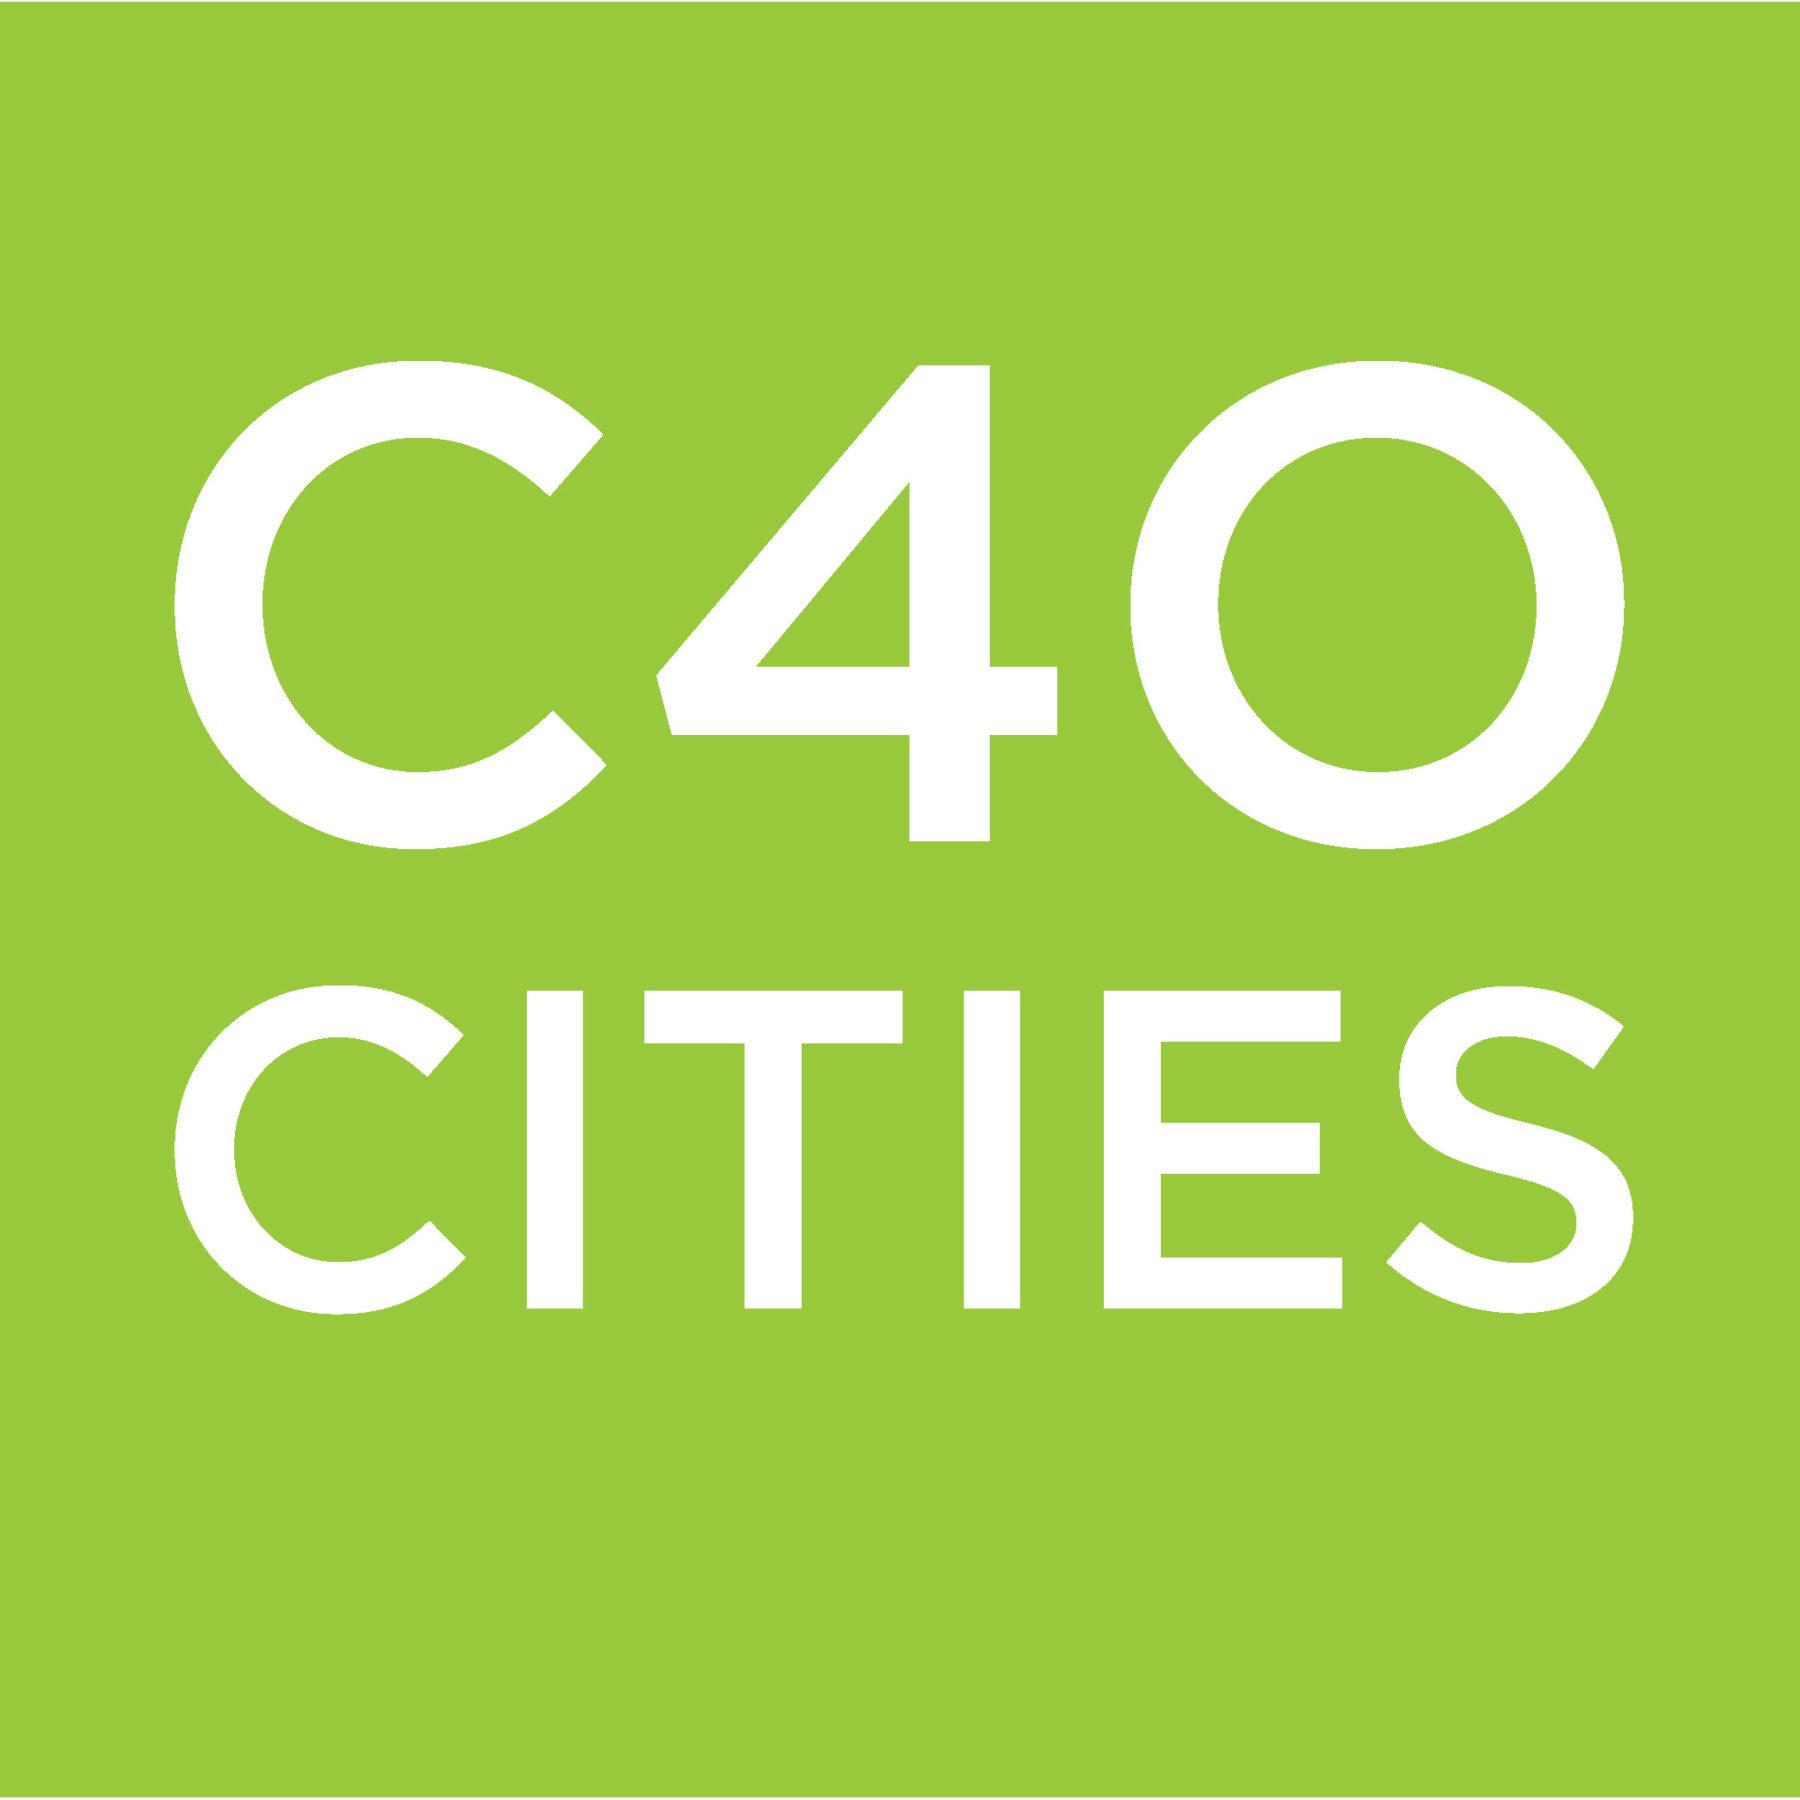 C40 Citieis